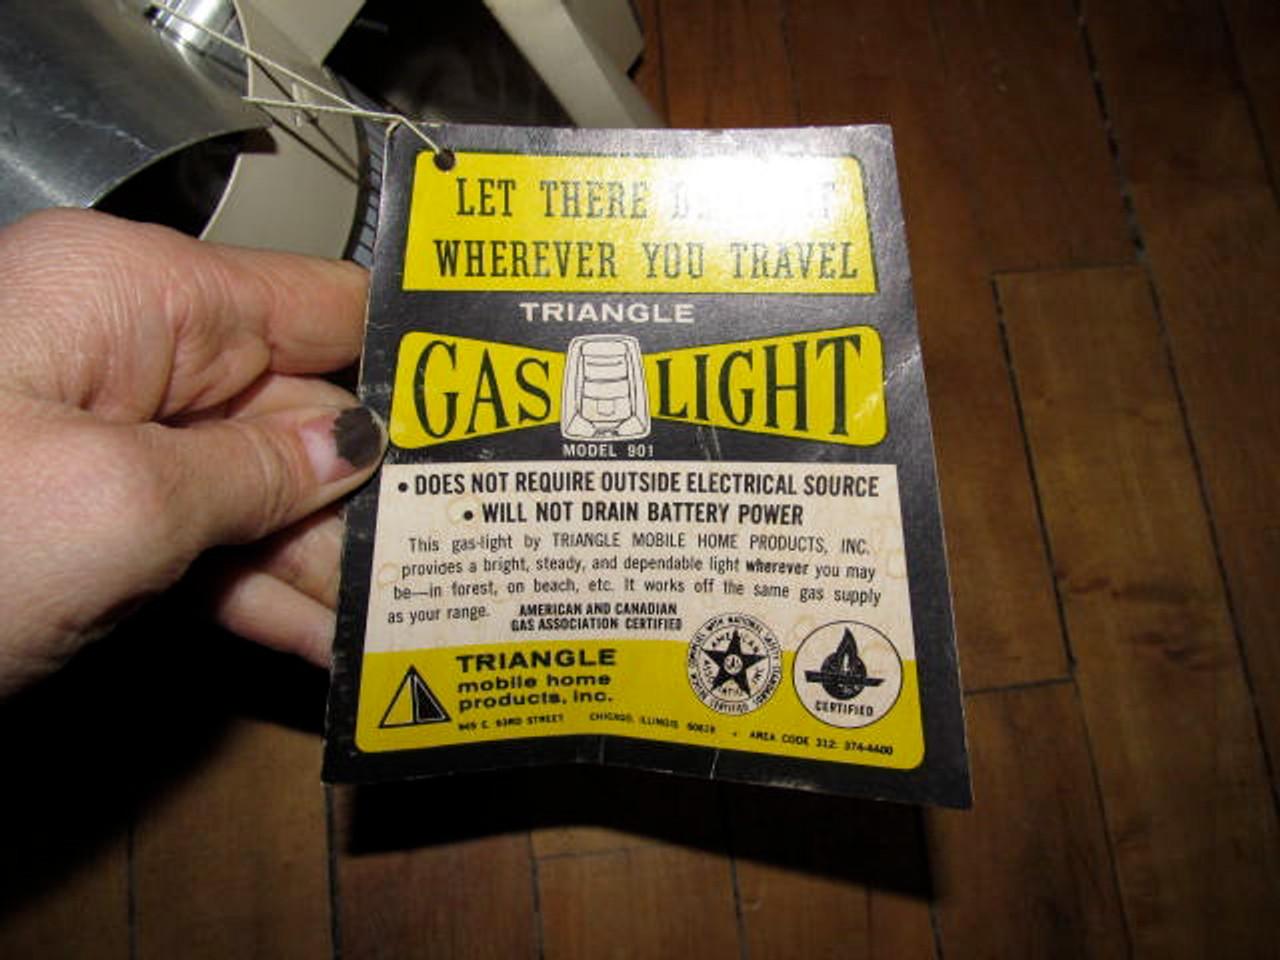 Triangle Gas Light (LT365)